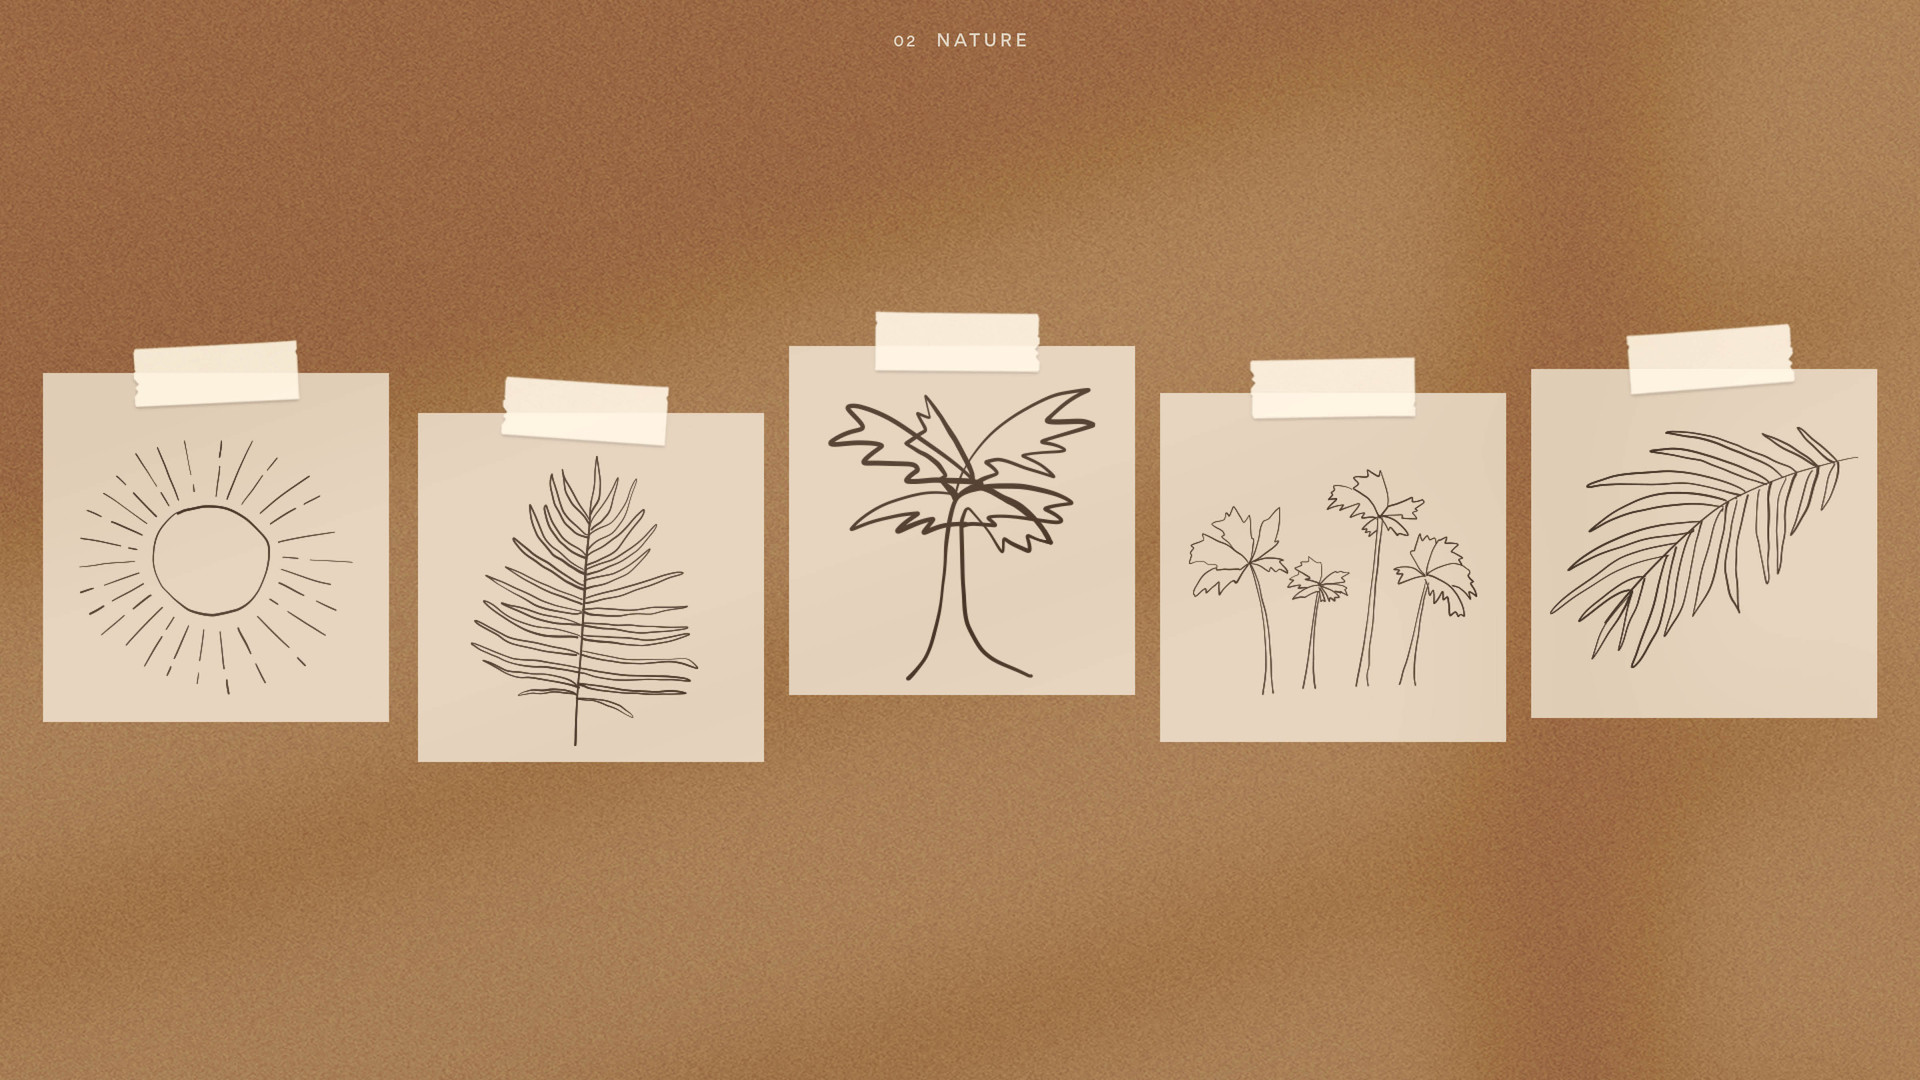 trees leaves sun nature drawings for branding